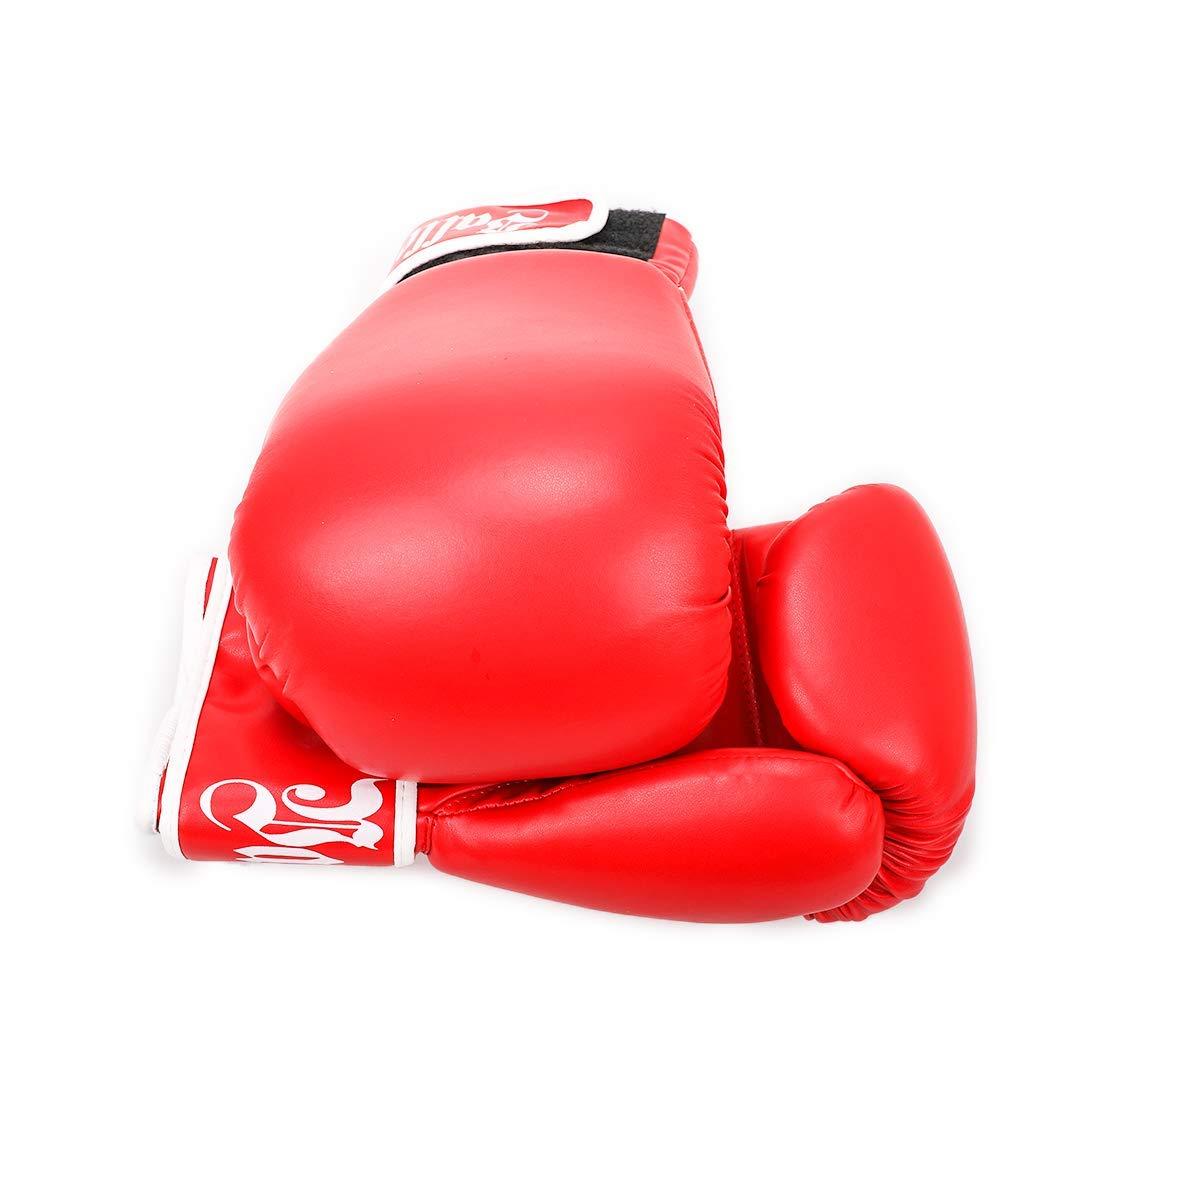 Kickboxing Bagwork Gel Sparring Training Gloves Valleycomfy Pro Grade Boxing Gloves Muay Thai Style Punching Bag Mitts Fight Gloves Men /& Women Renewed